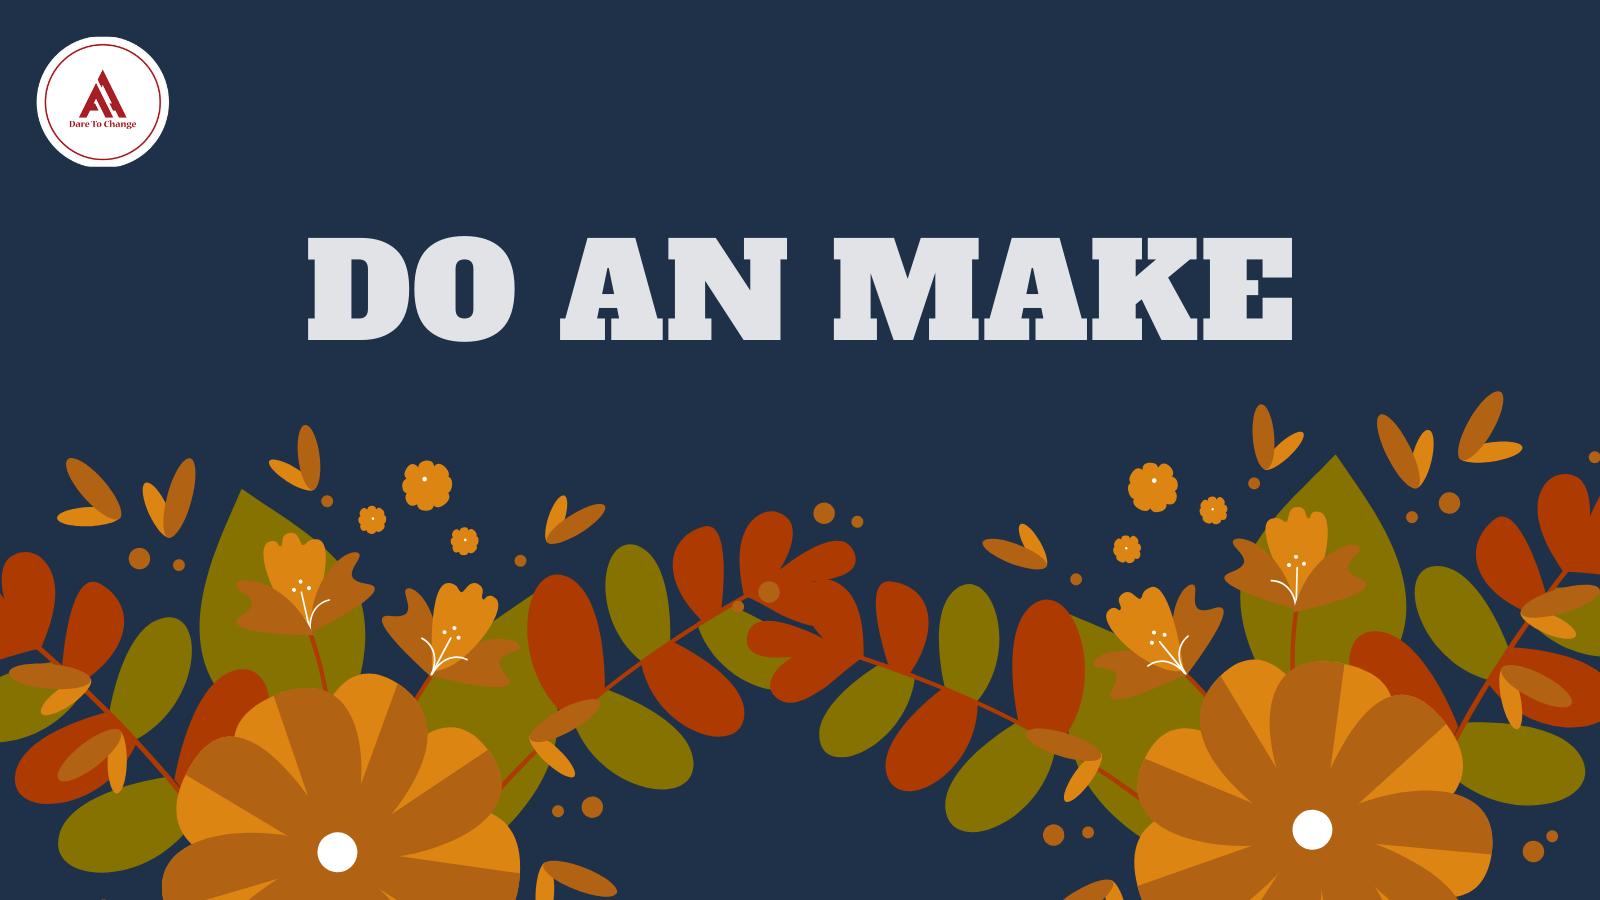 Do an Make